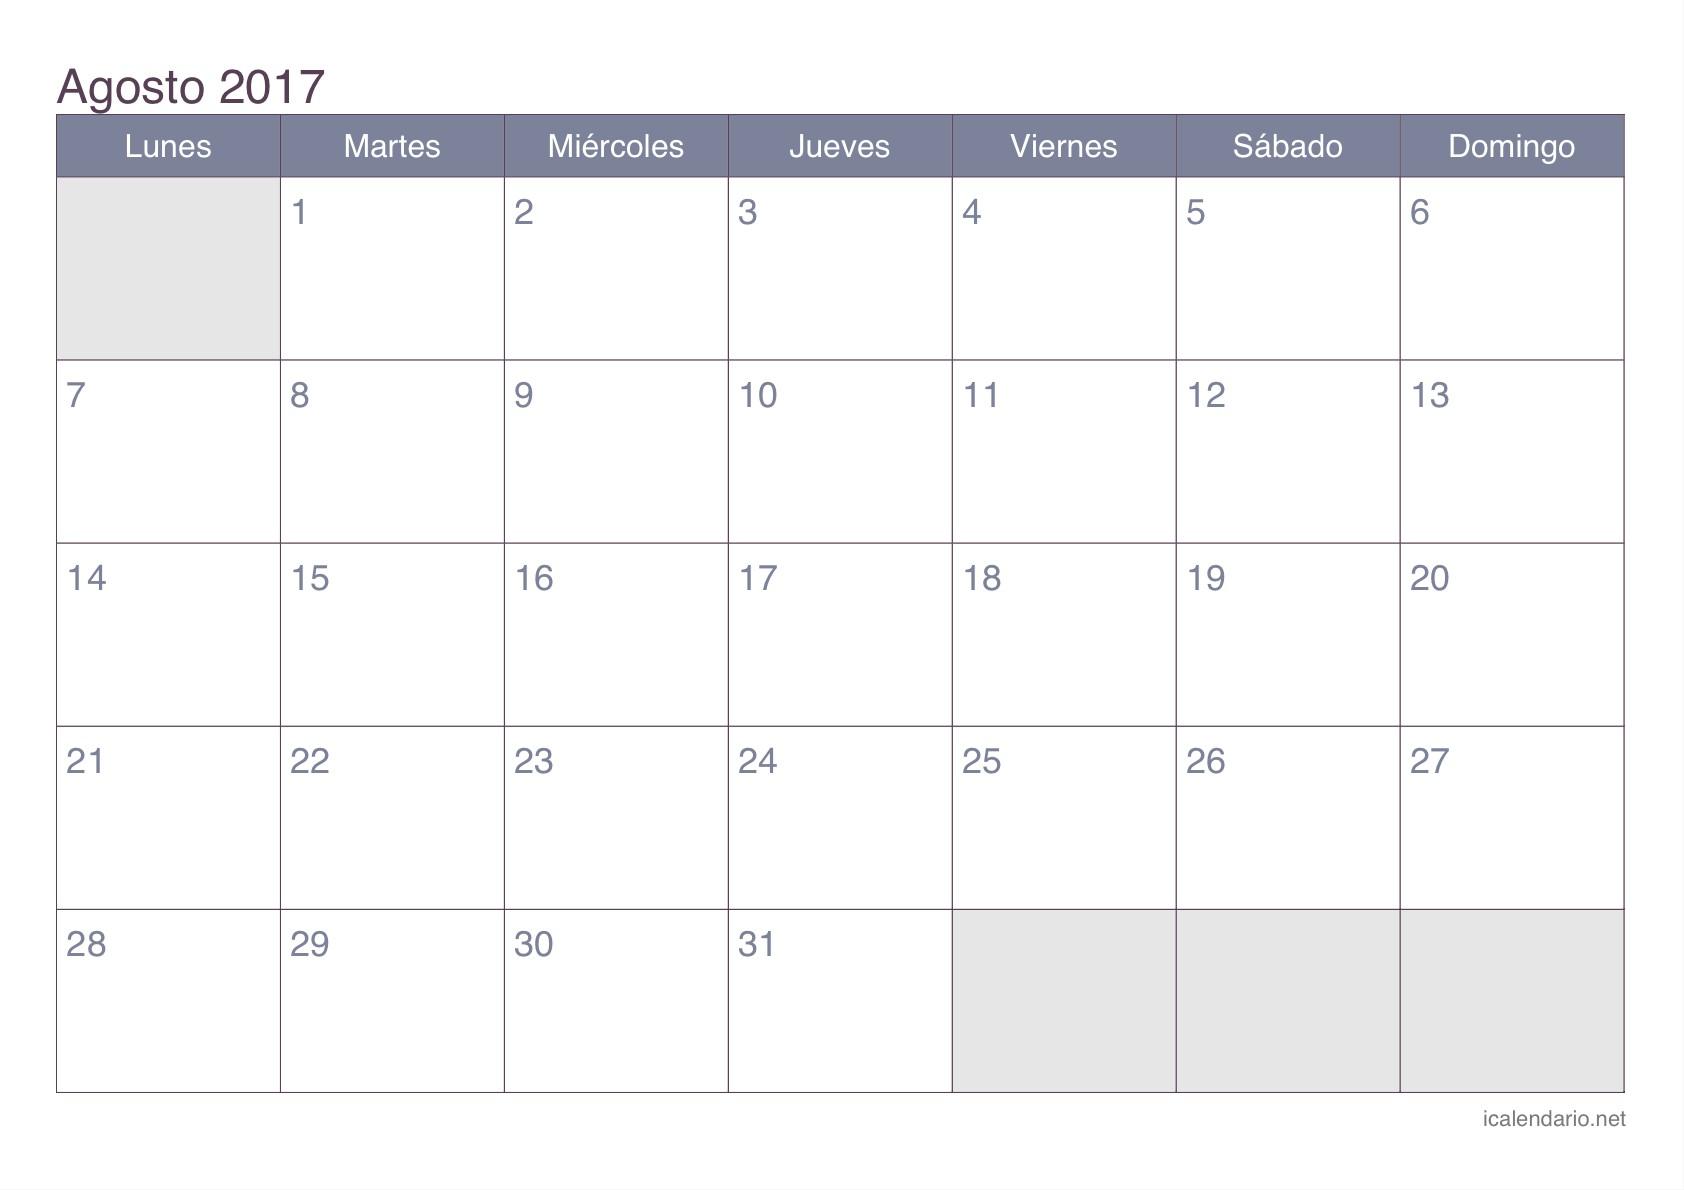 Resultado de imagen para calendario agosto 2017